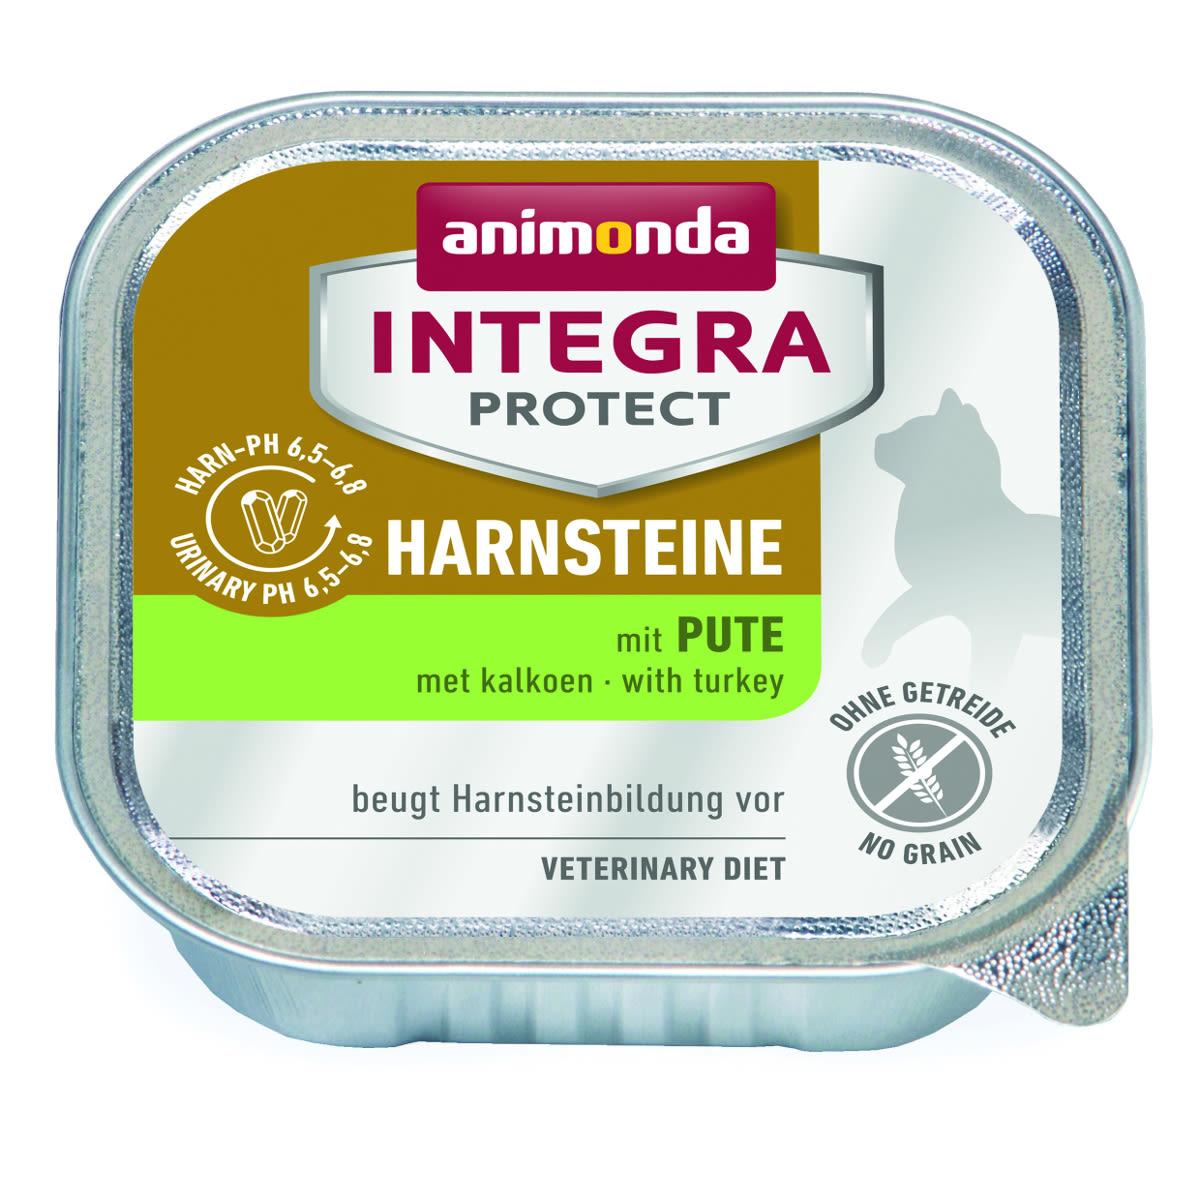 Animonda Integra Harnsteine Katze mit Pute